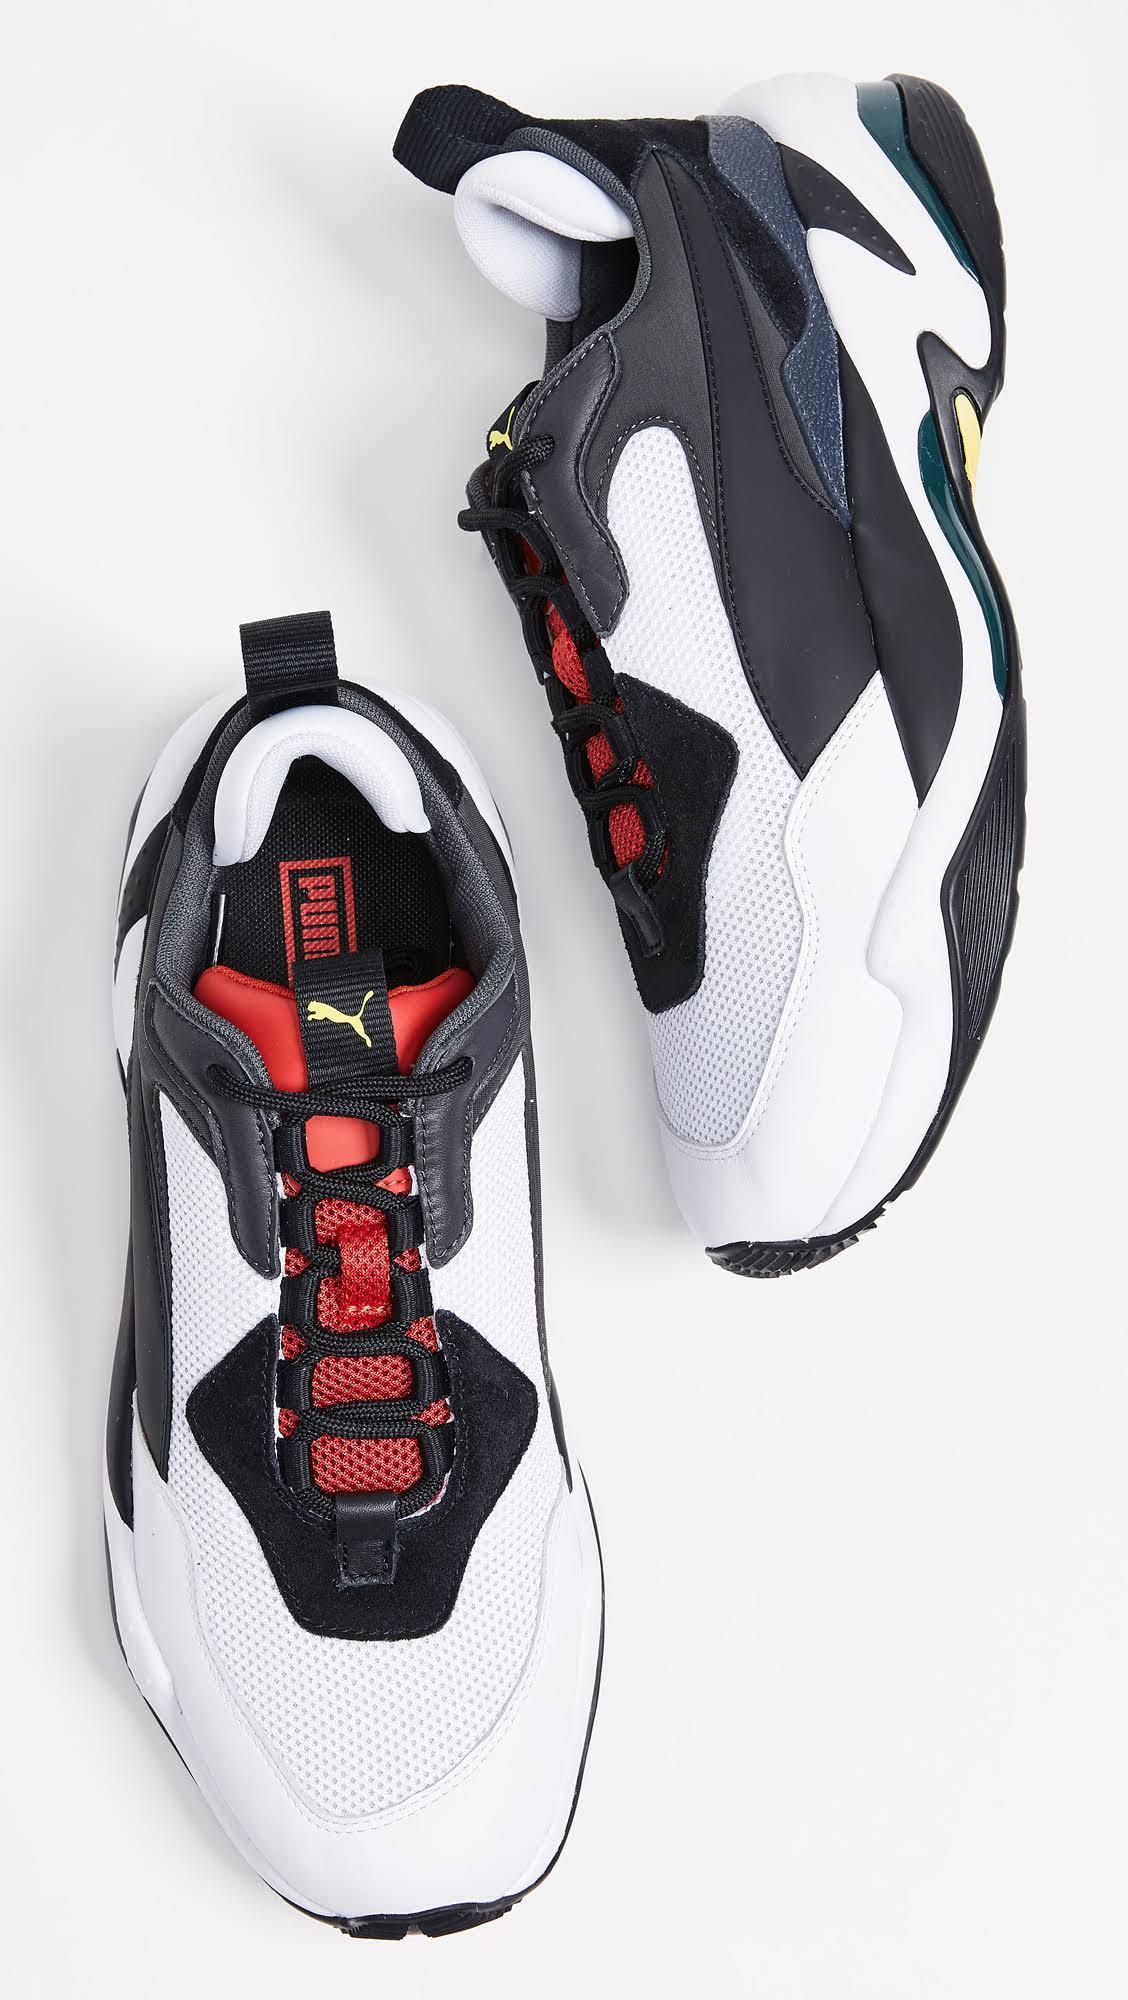 Puma Thunder herenzwartmaat voor zwarthoog risico 9 sneakers 5 rood lederen Spectra Y7Iv6ybfg